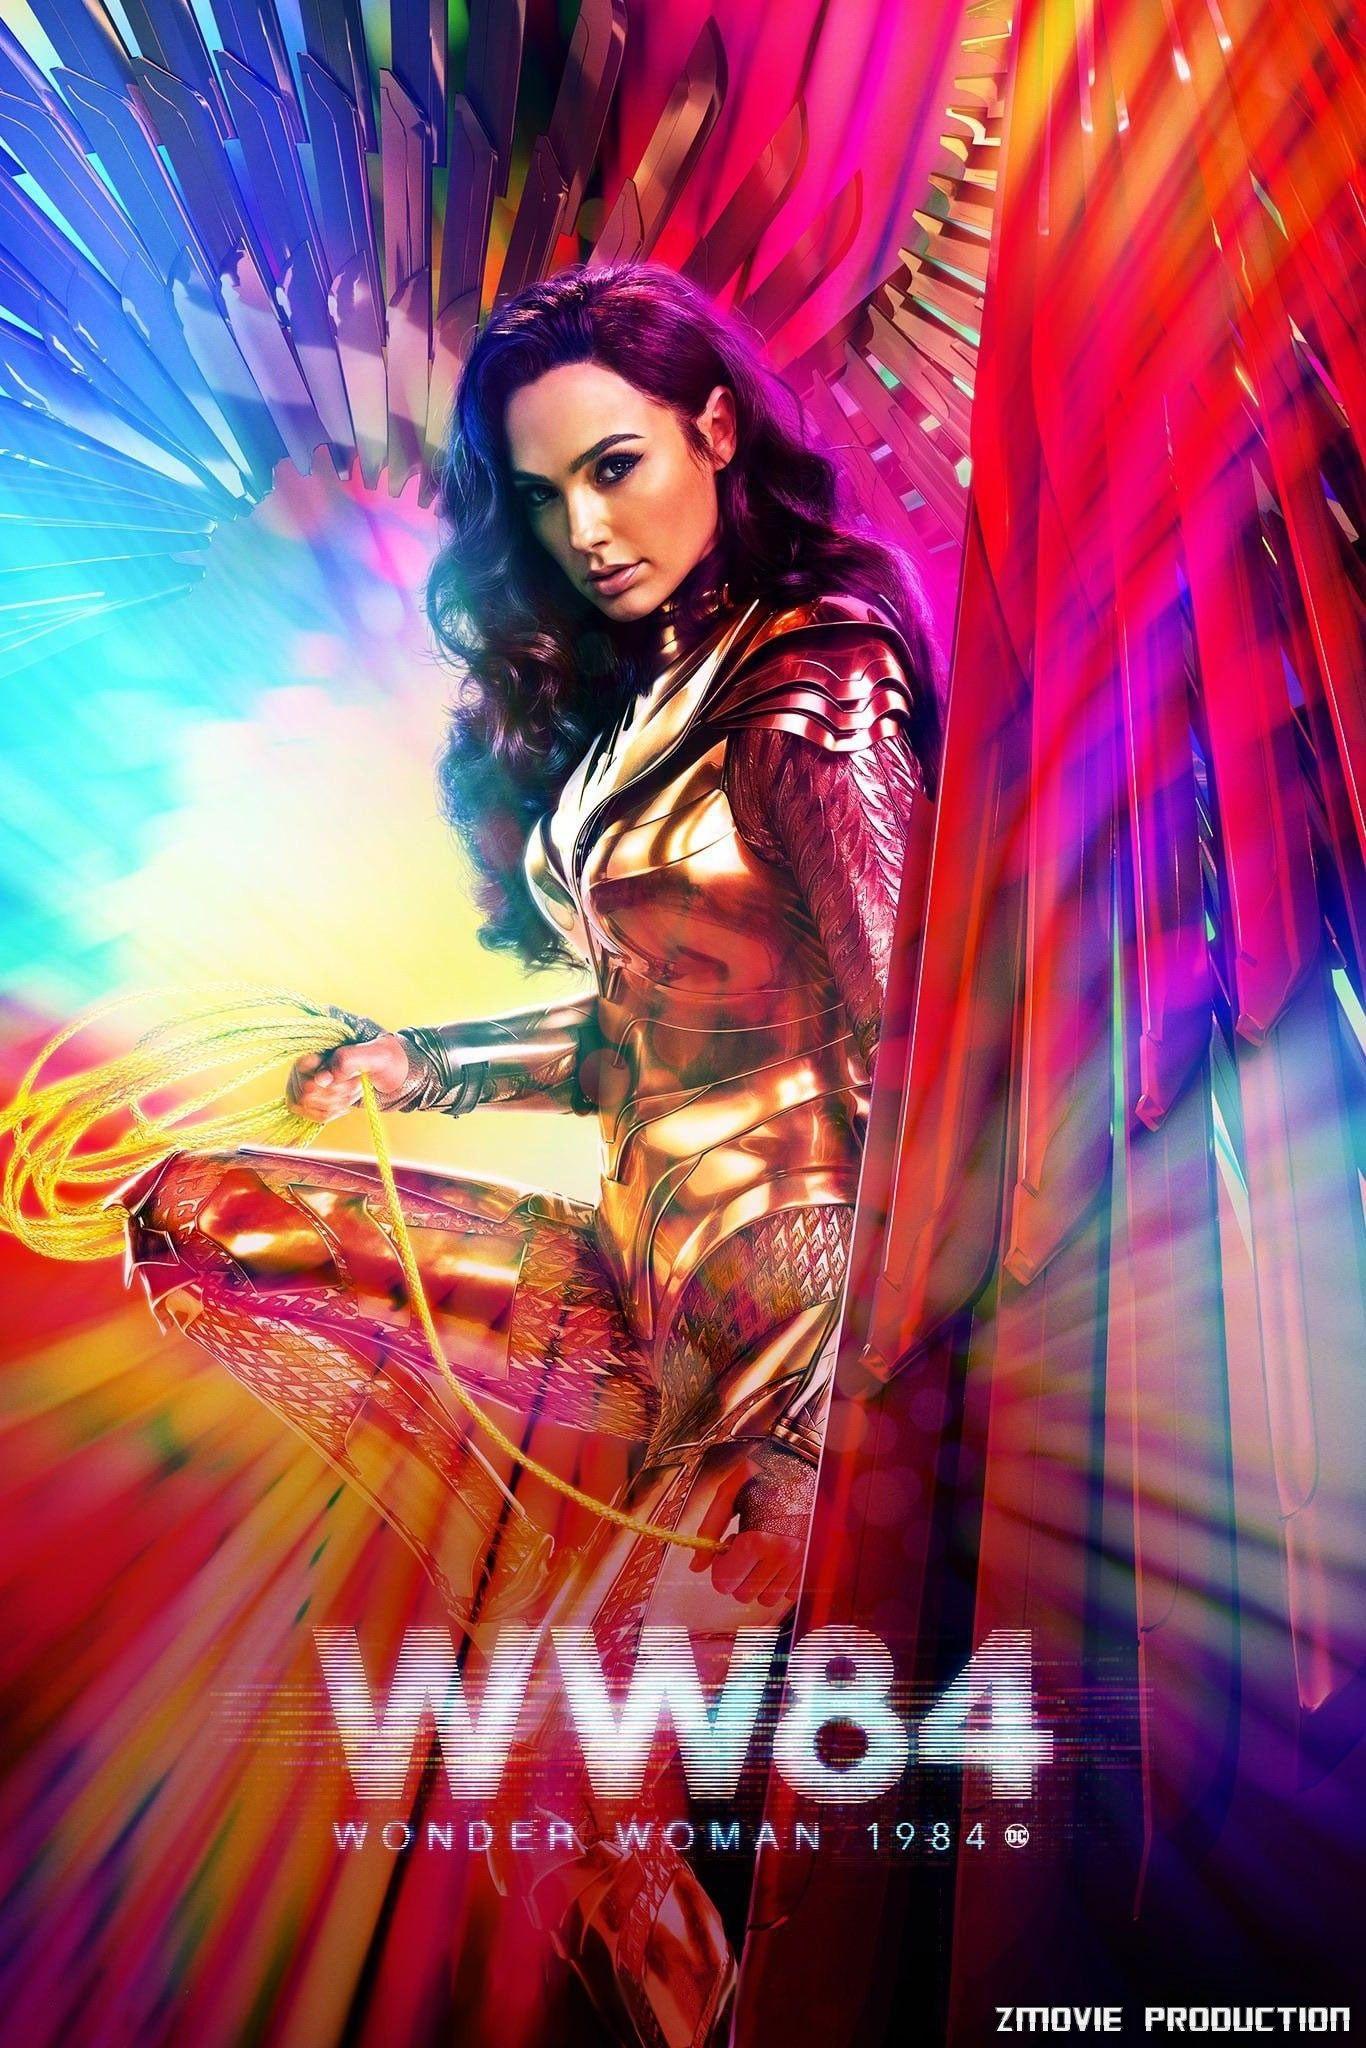 Regarder Wonder Woman 1984 2020 Film Complet En Francais Vf Gratuit Wonder Woman 1984 Movie Gal Gadot Wonder Woman